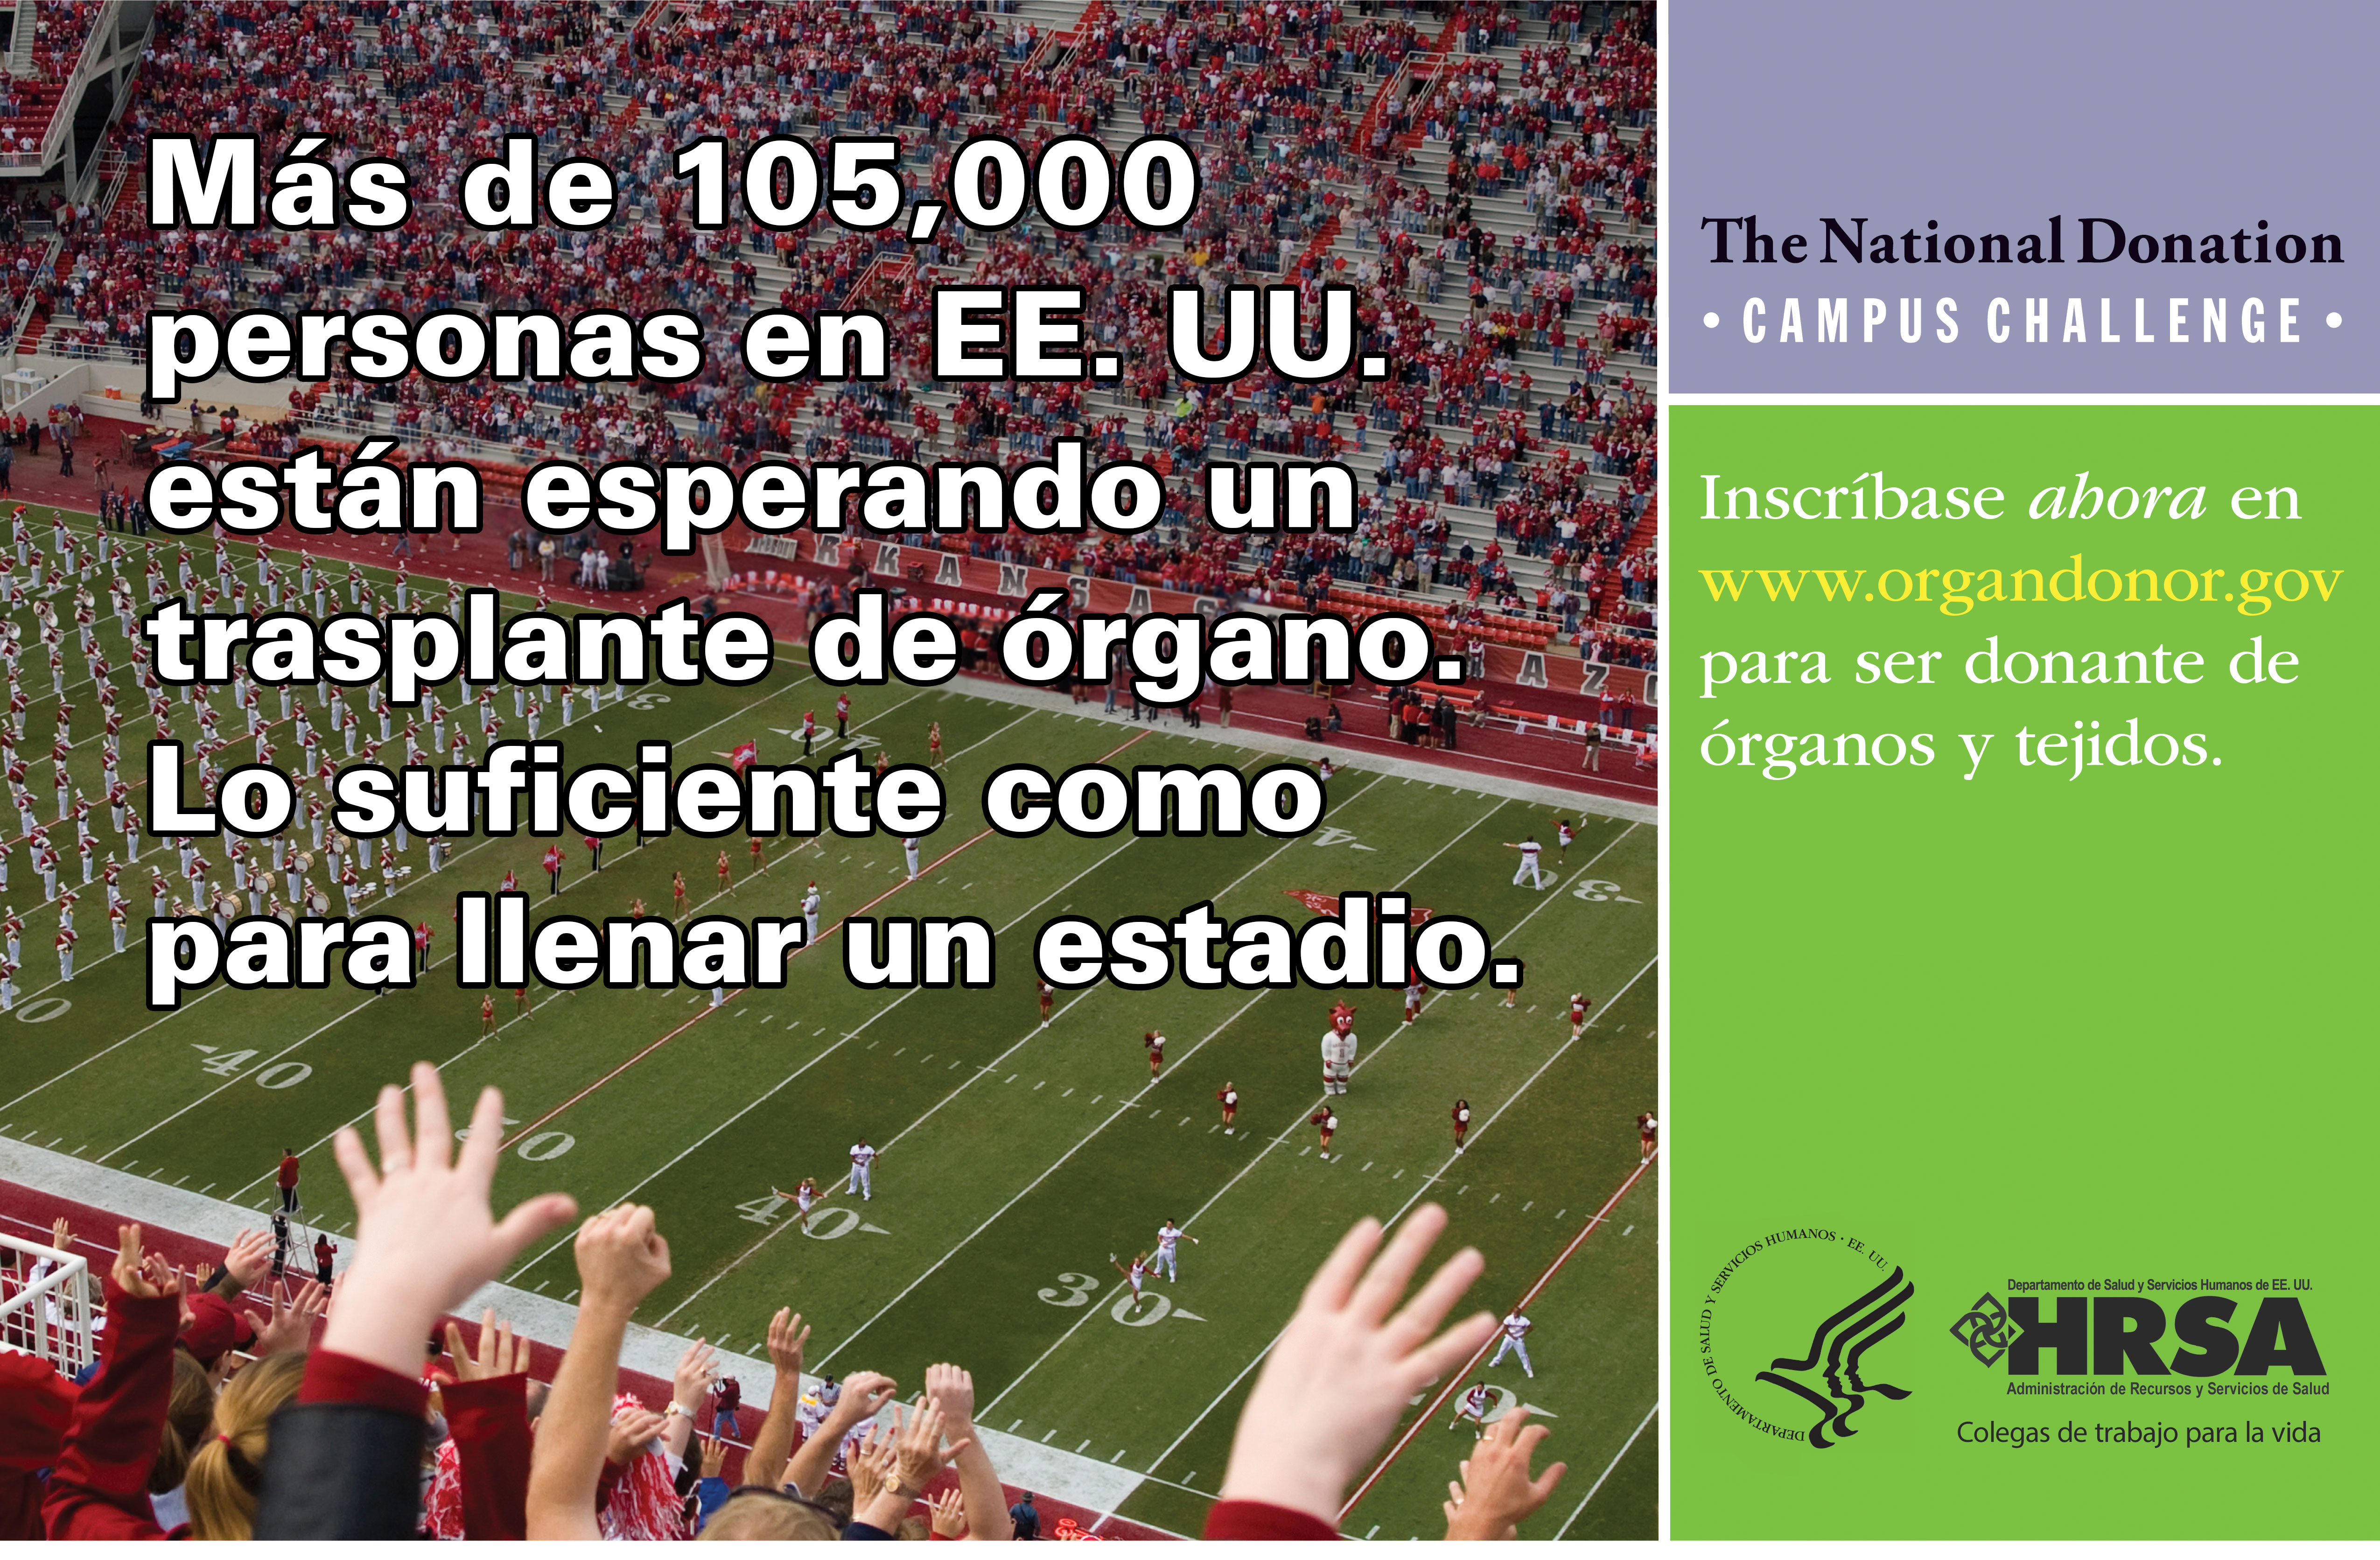 Estadio - póster - imagen de enlace de HRSA.